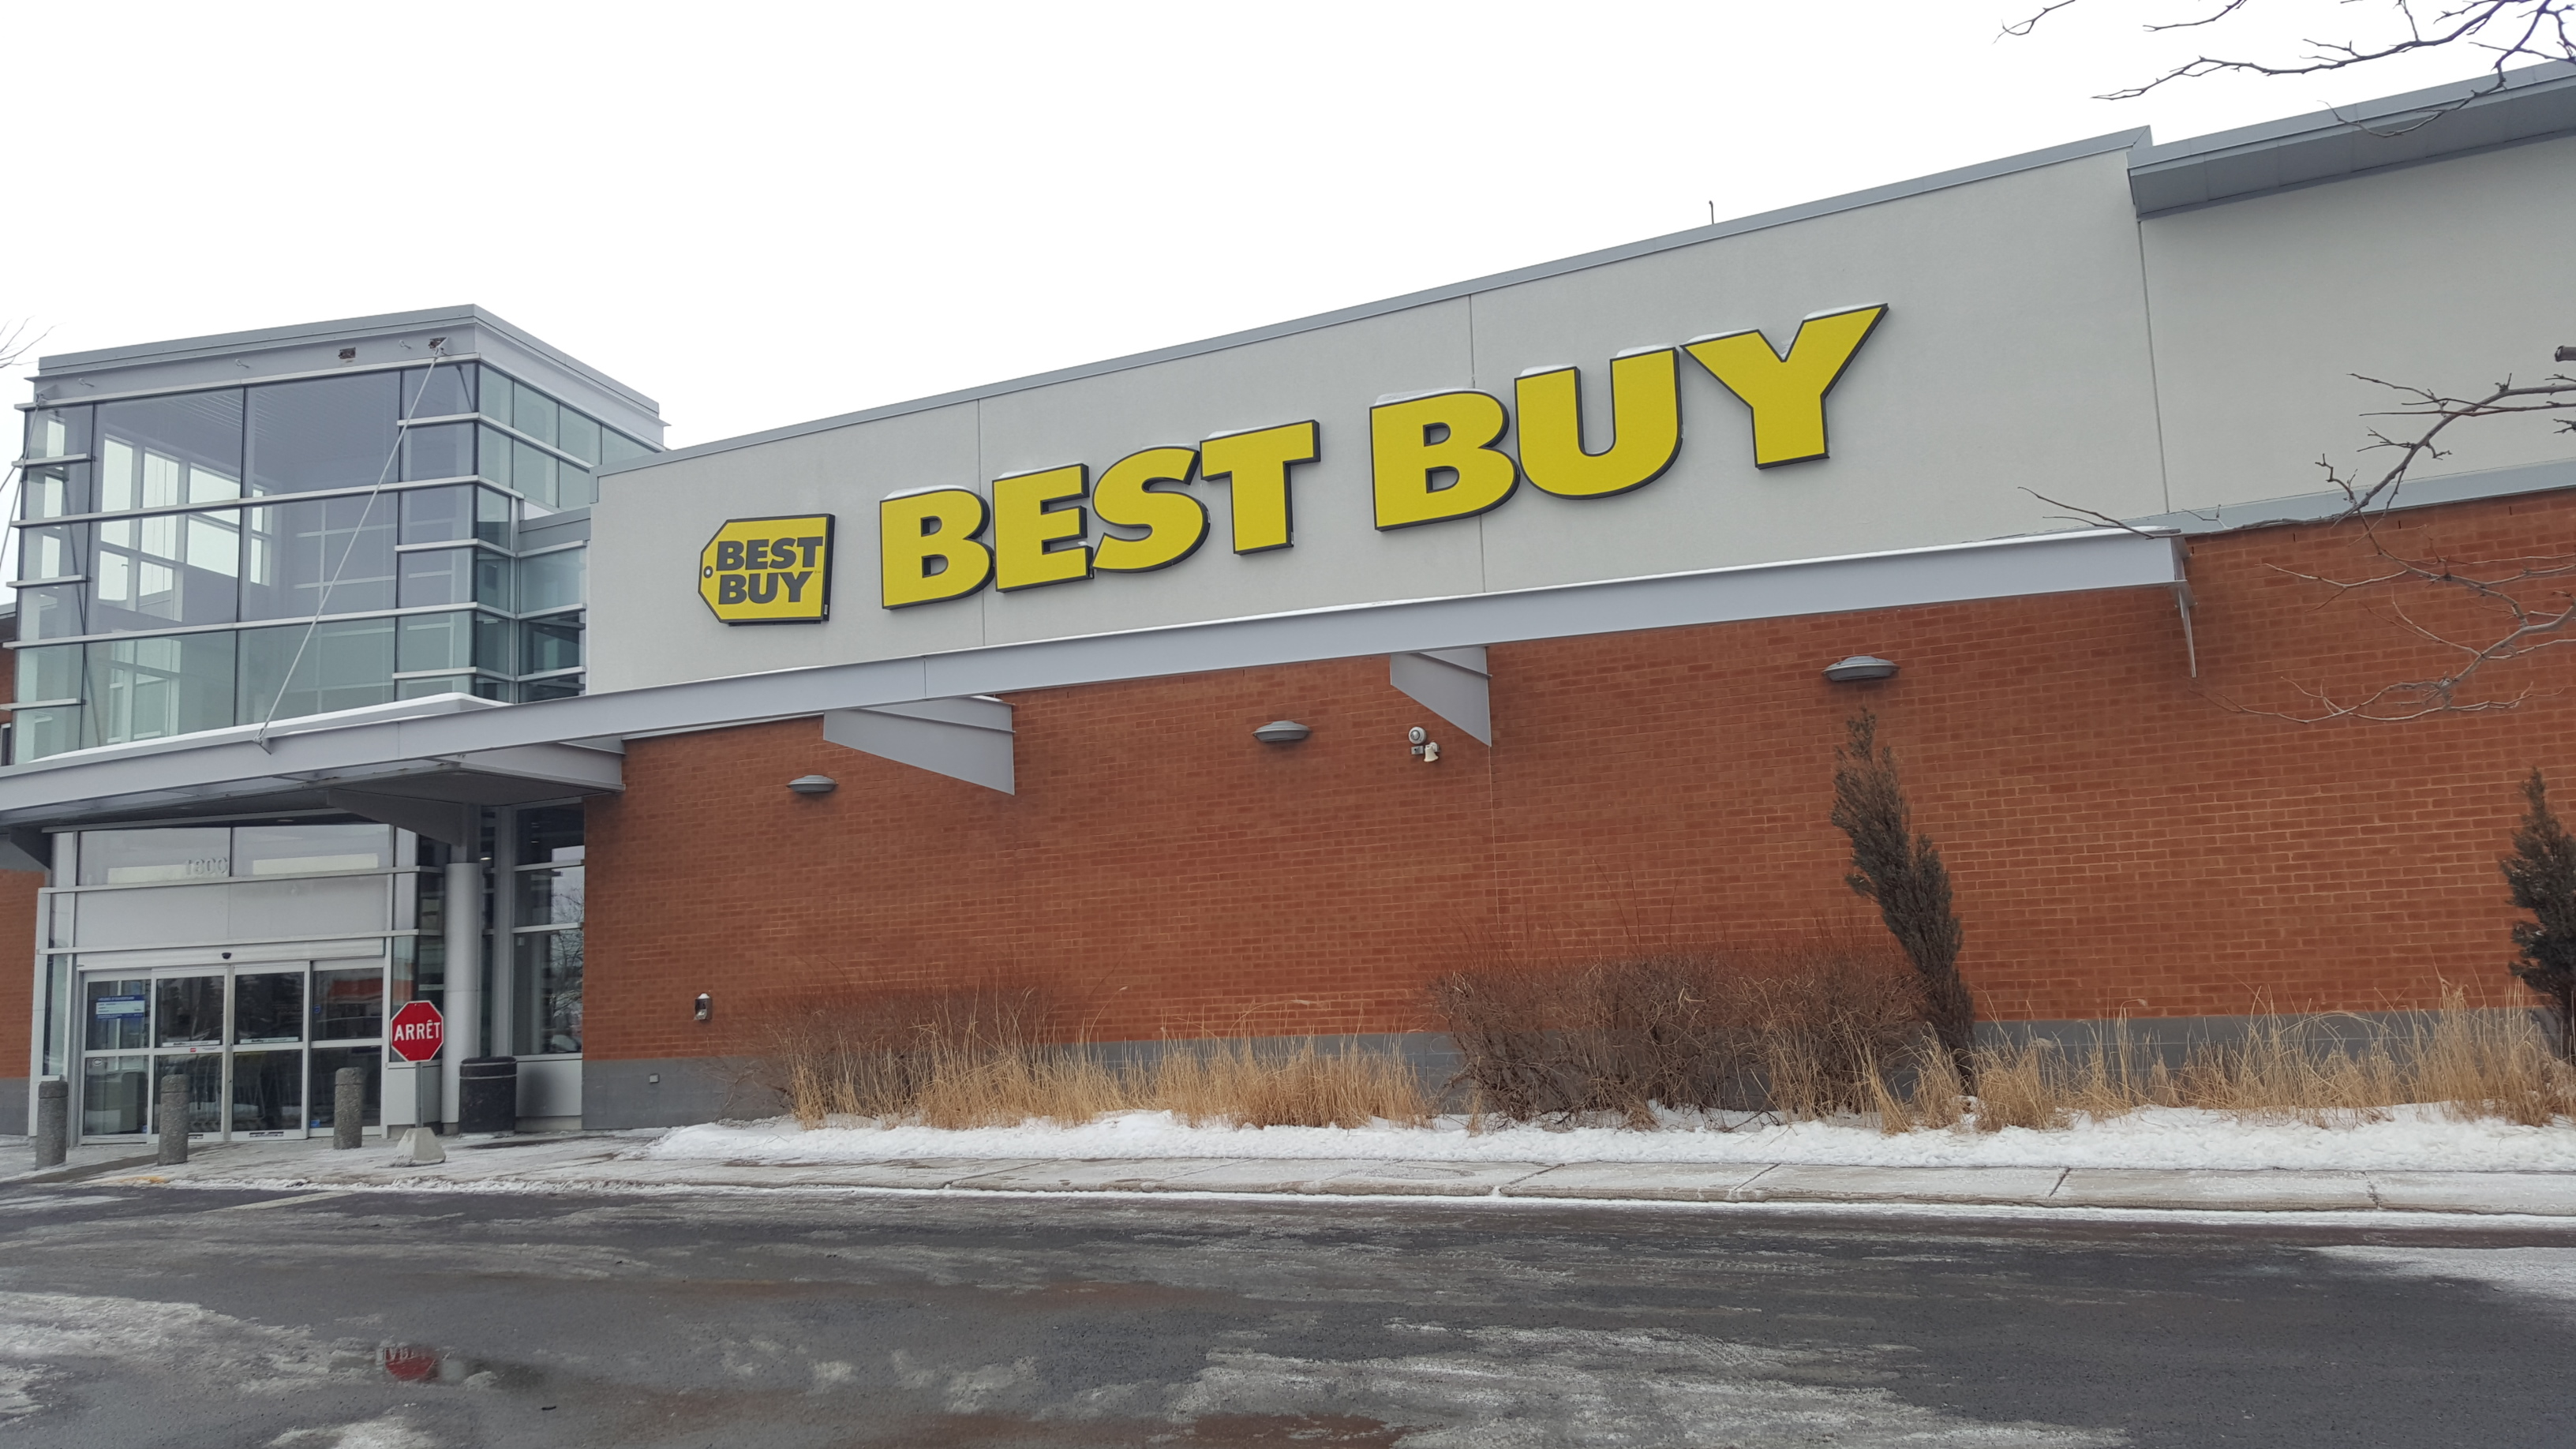 Best Buy à Longueuil: Best Buy in Taschereau, Greenfield Park, Quebec